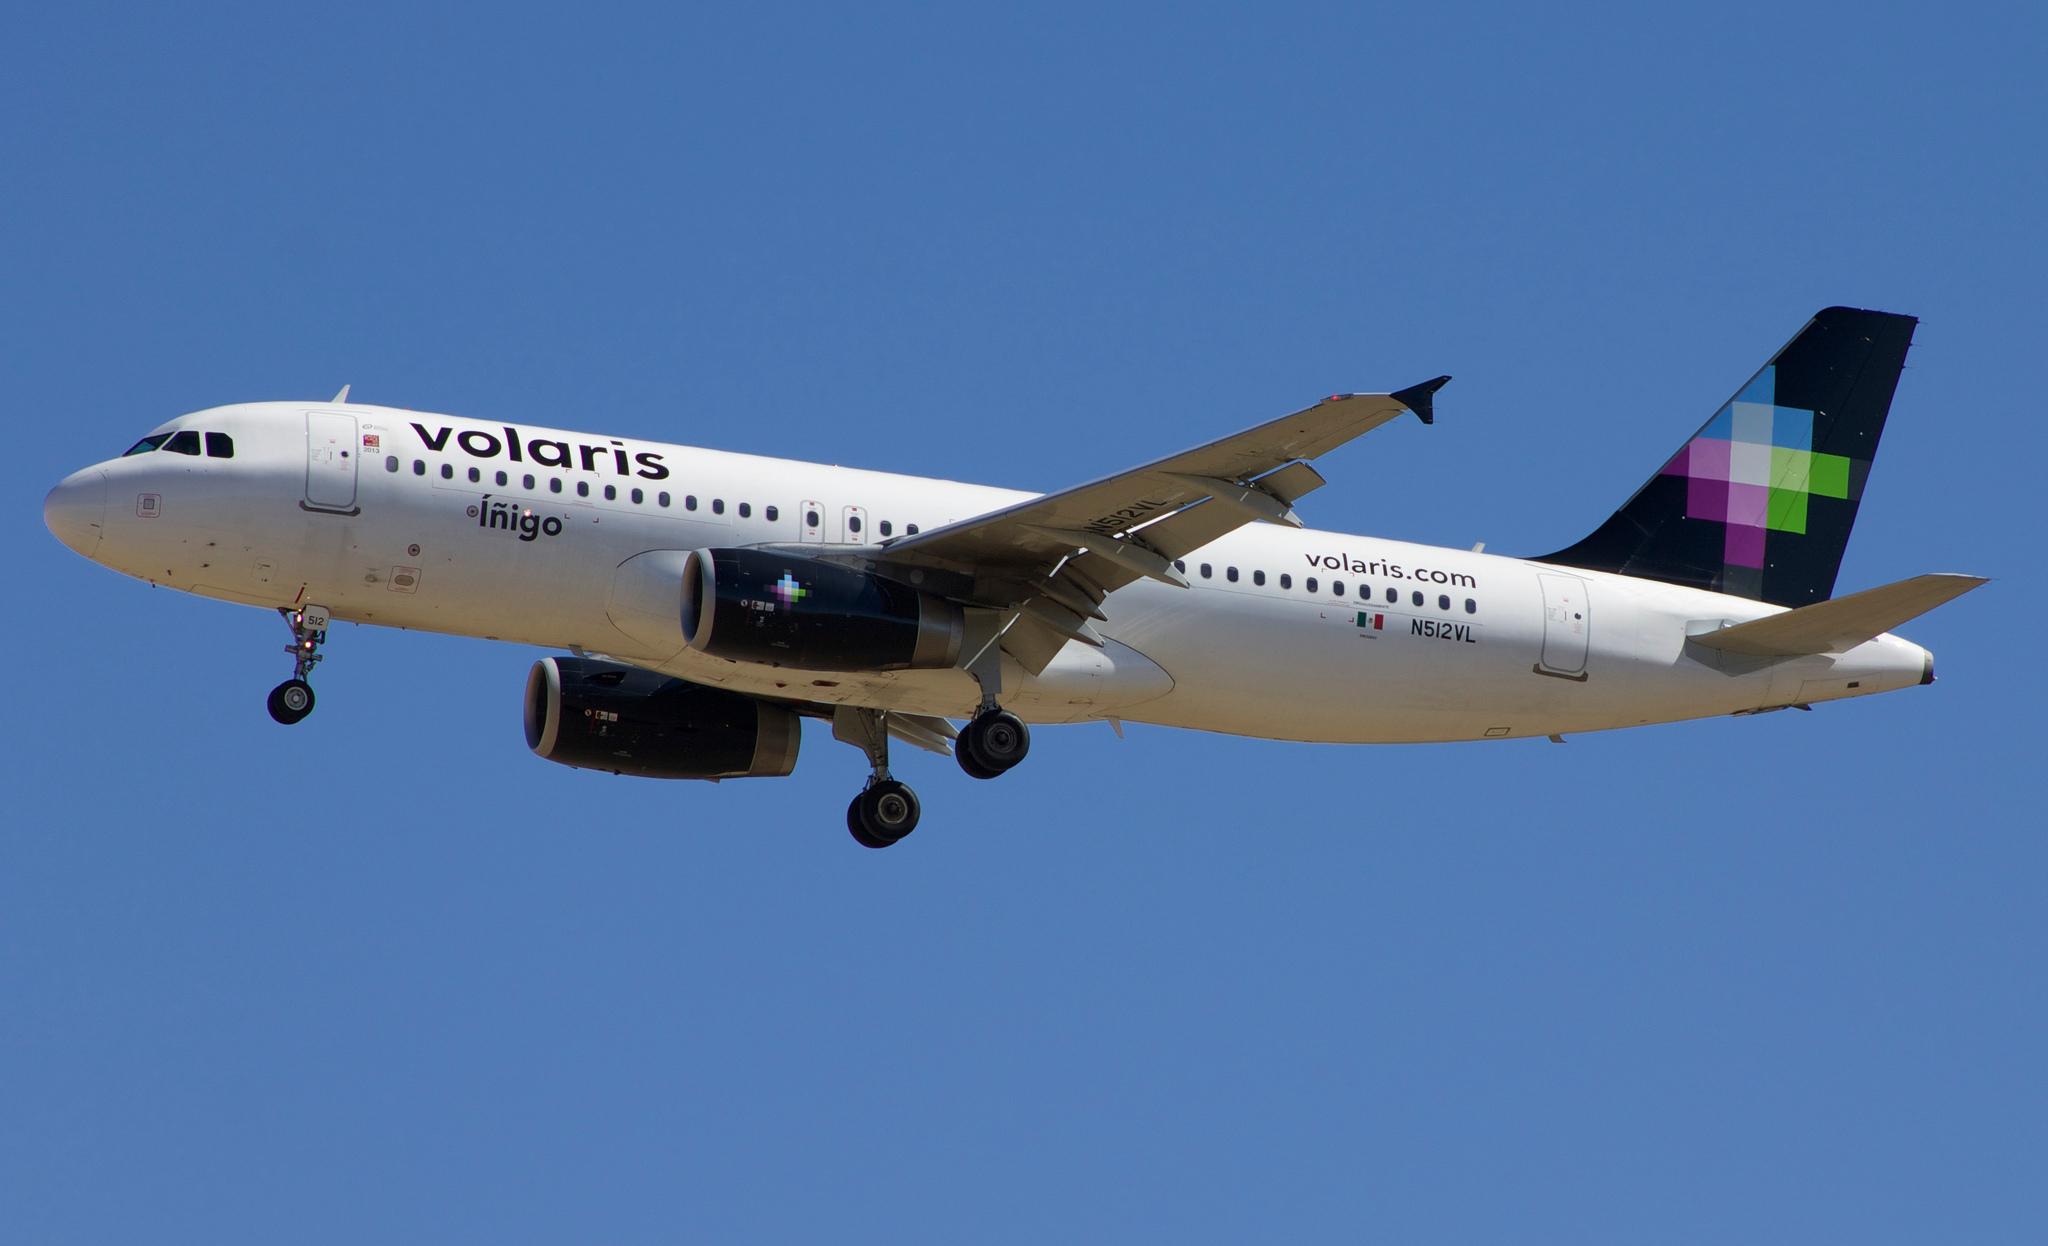 A Volaris plane in flight